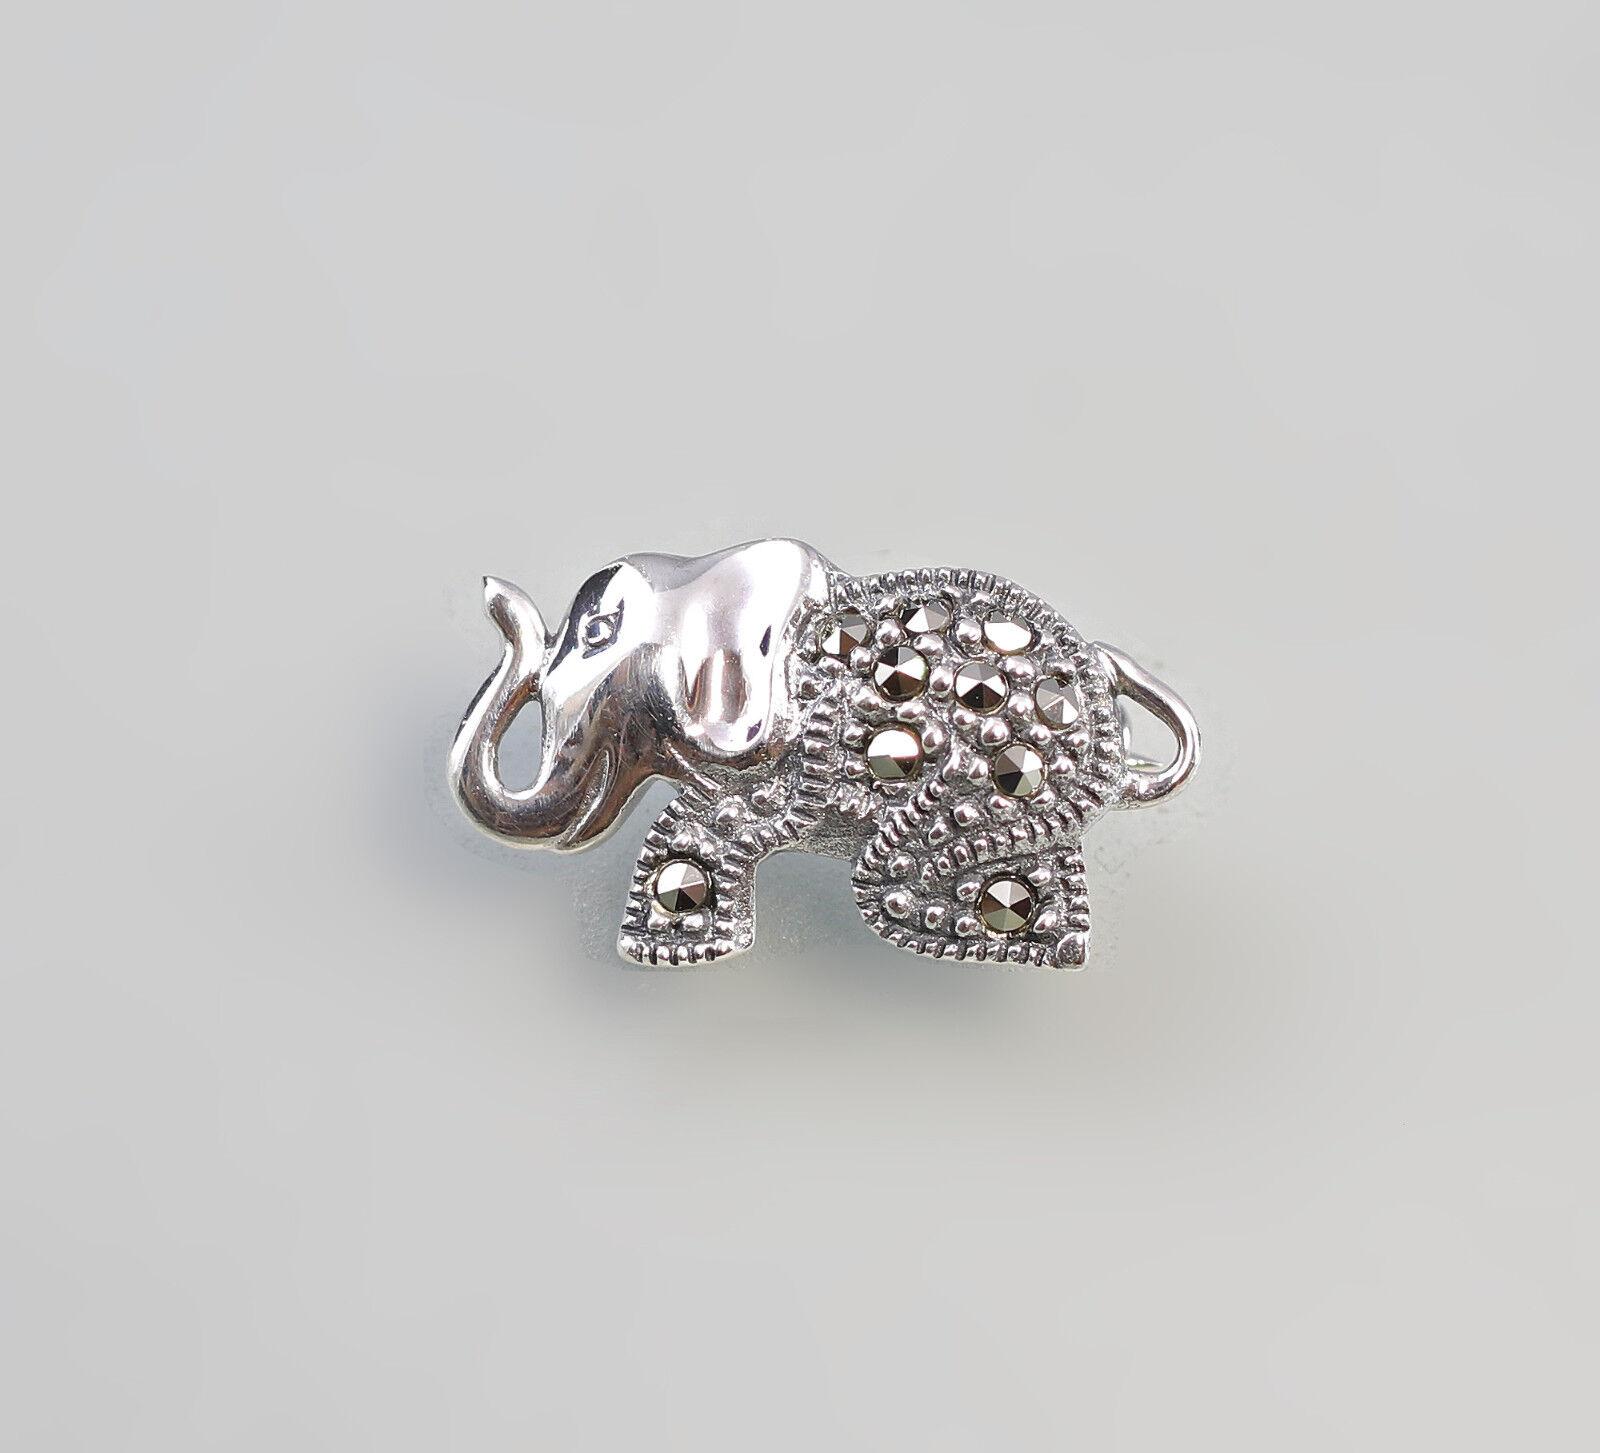 9927496 925er silver Anhänger Elefant Markasiten D1,5cm